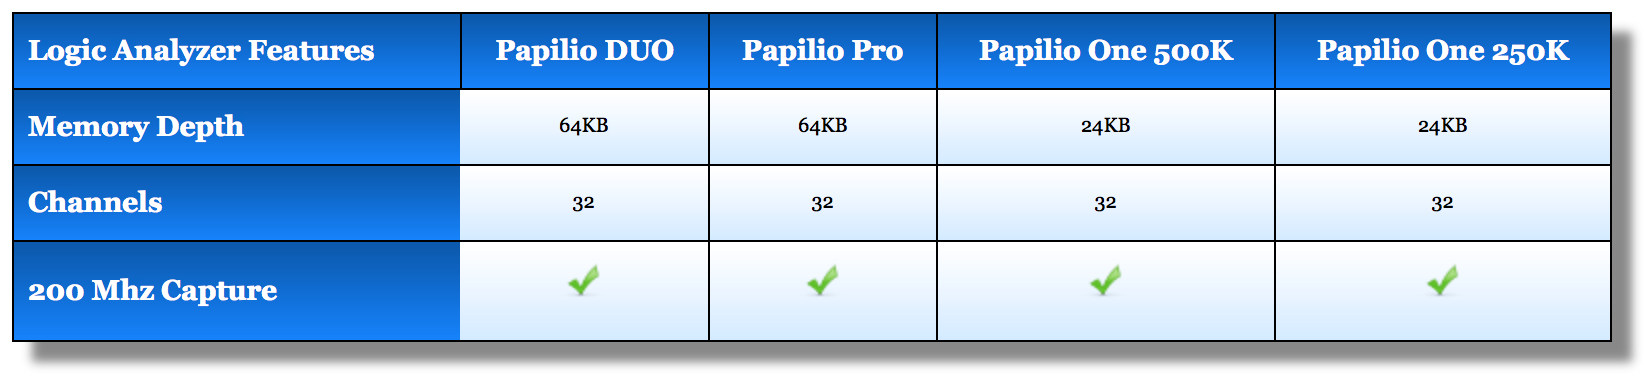 la-kit-compare-table.png